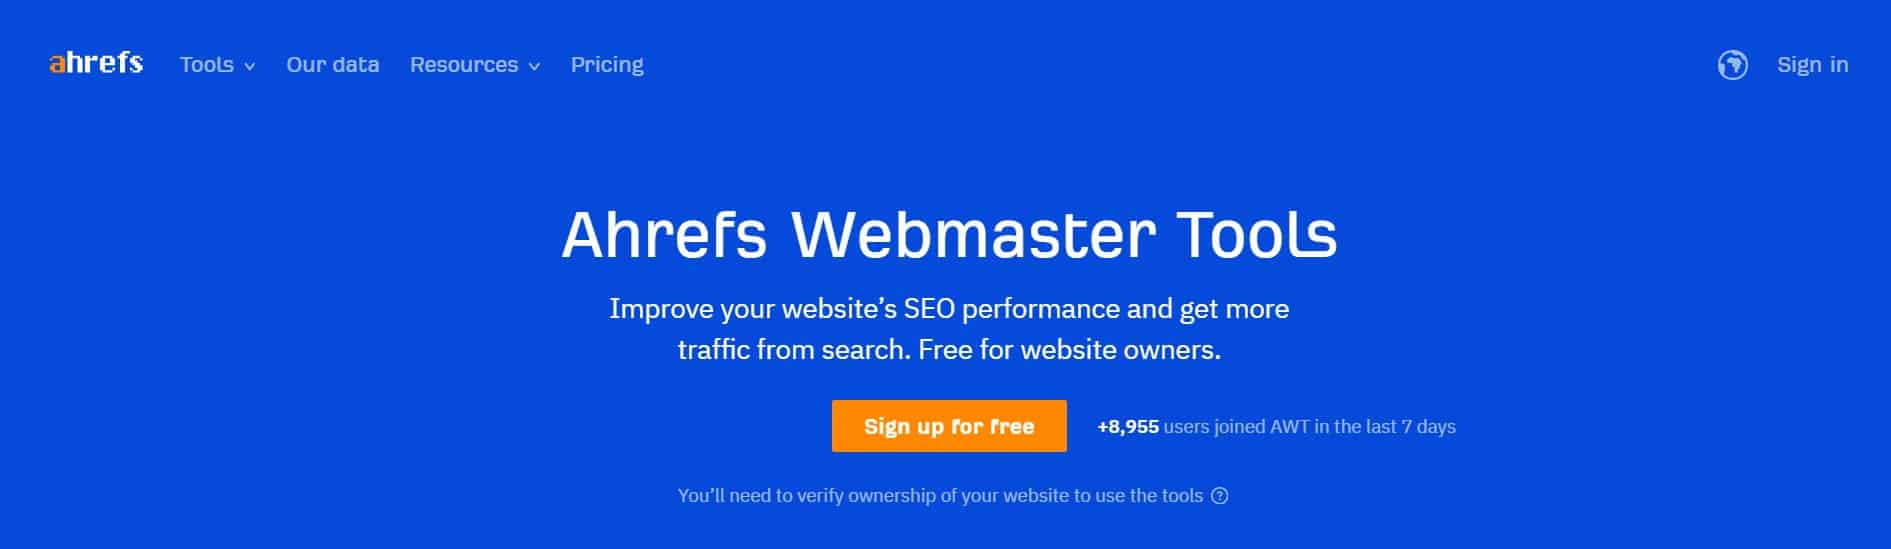 Ahrefs Webmaster Tool